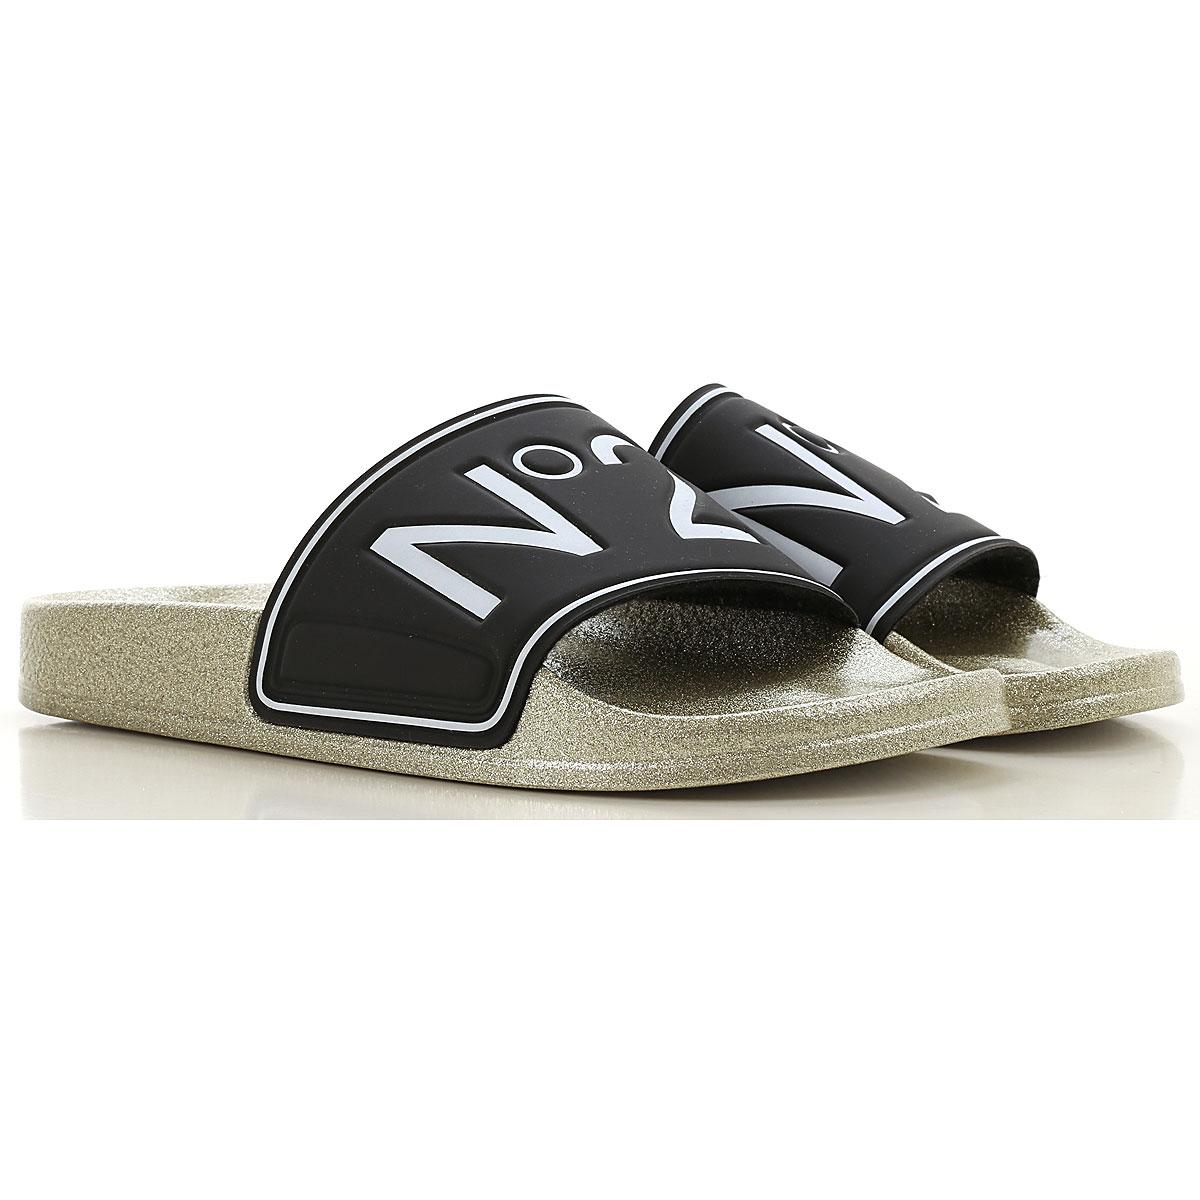 NO 21 Sandals for Women, Black, Rubber, 2019, 7 8